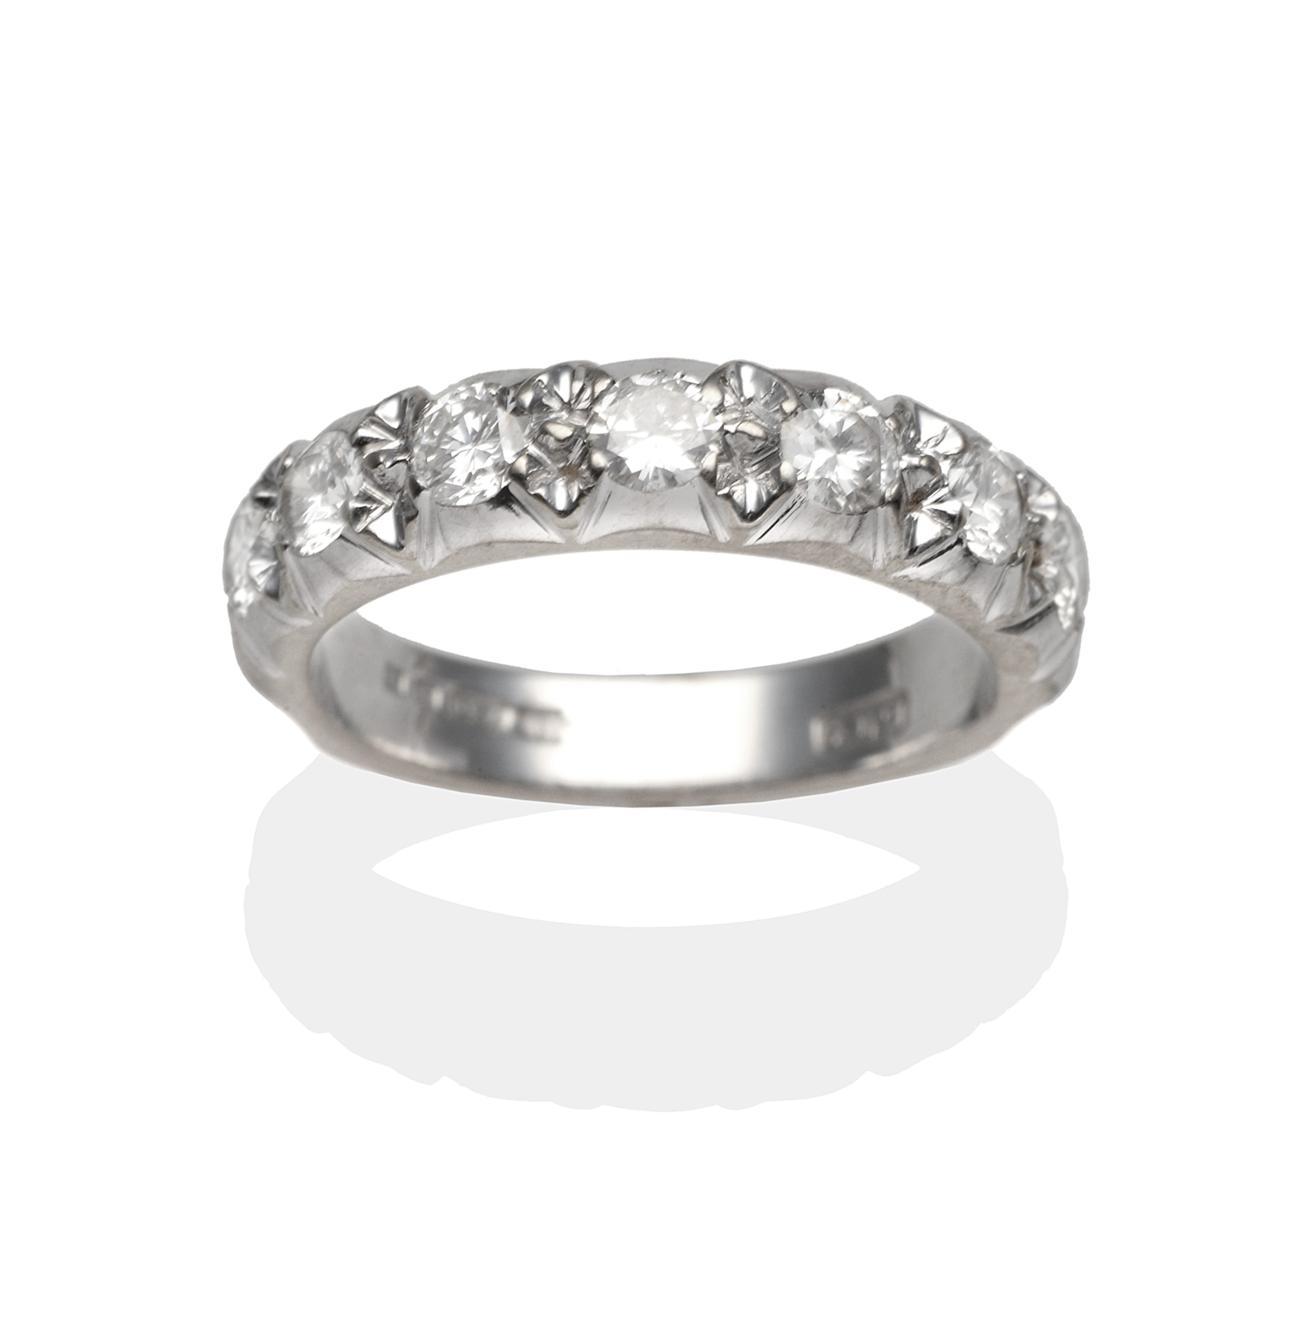 Tennants Auctioneers: An 18 Carat White Gold Diamond Half Hoop Ring